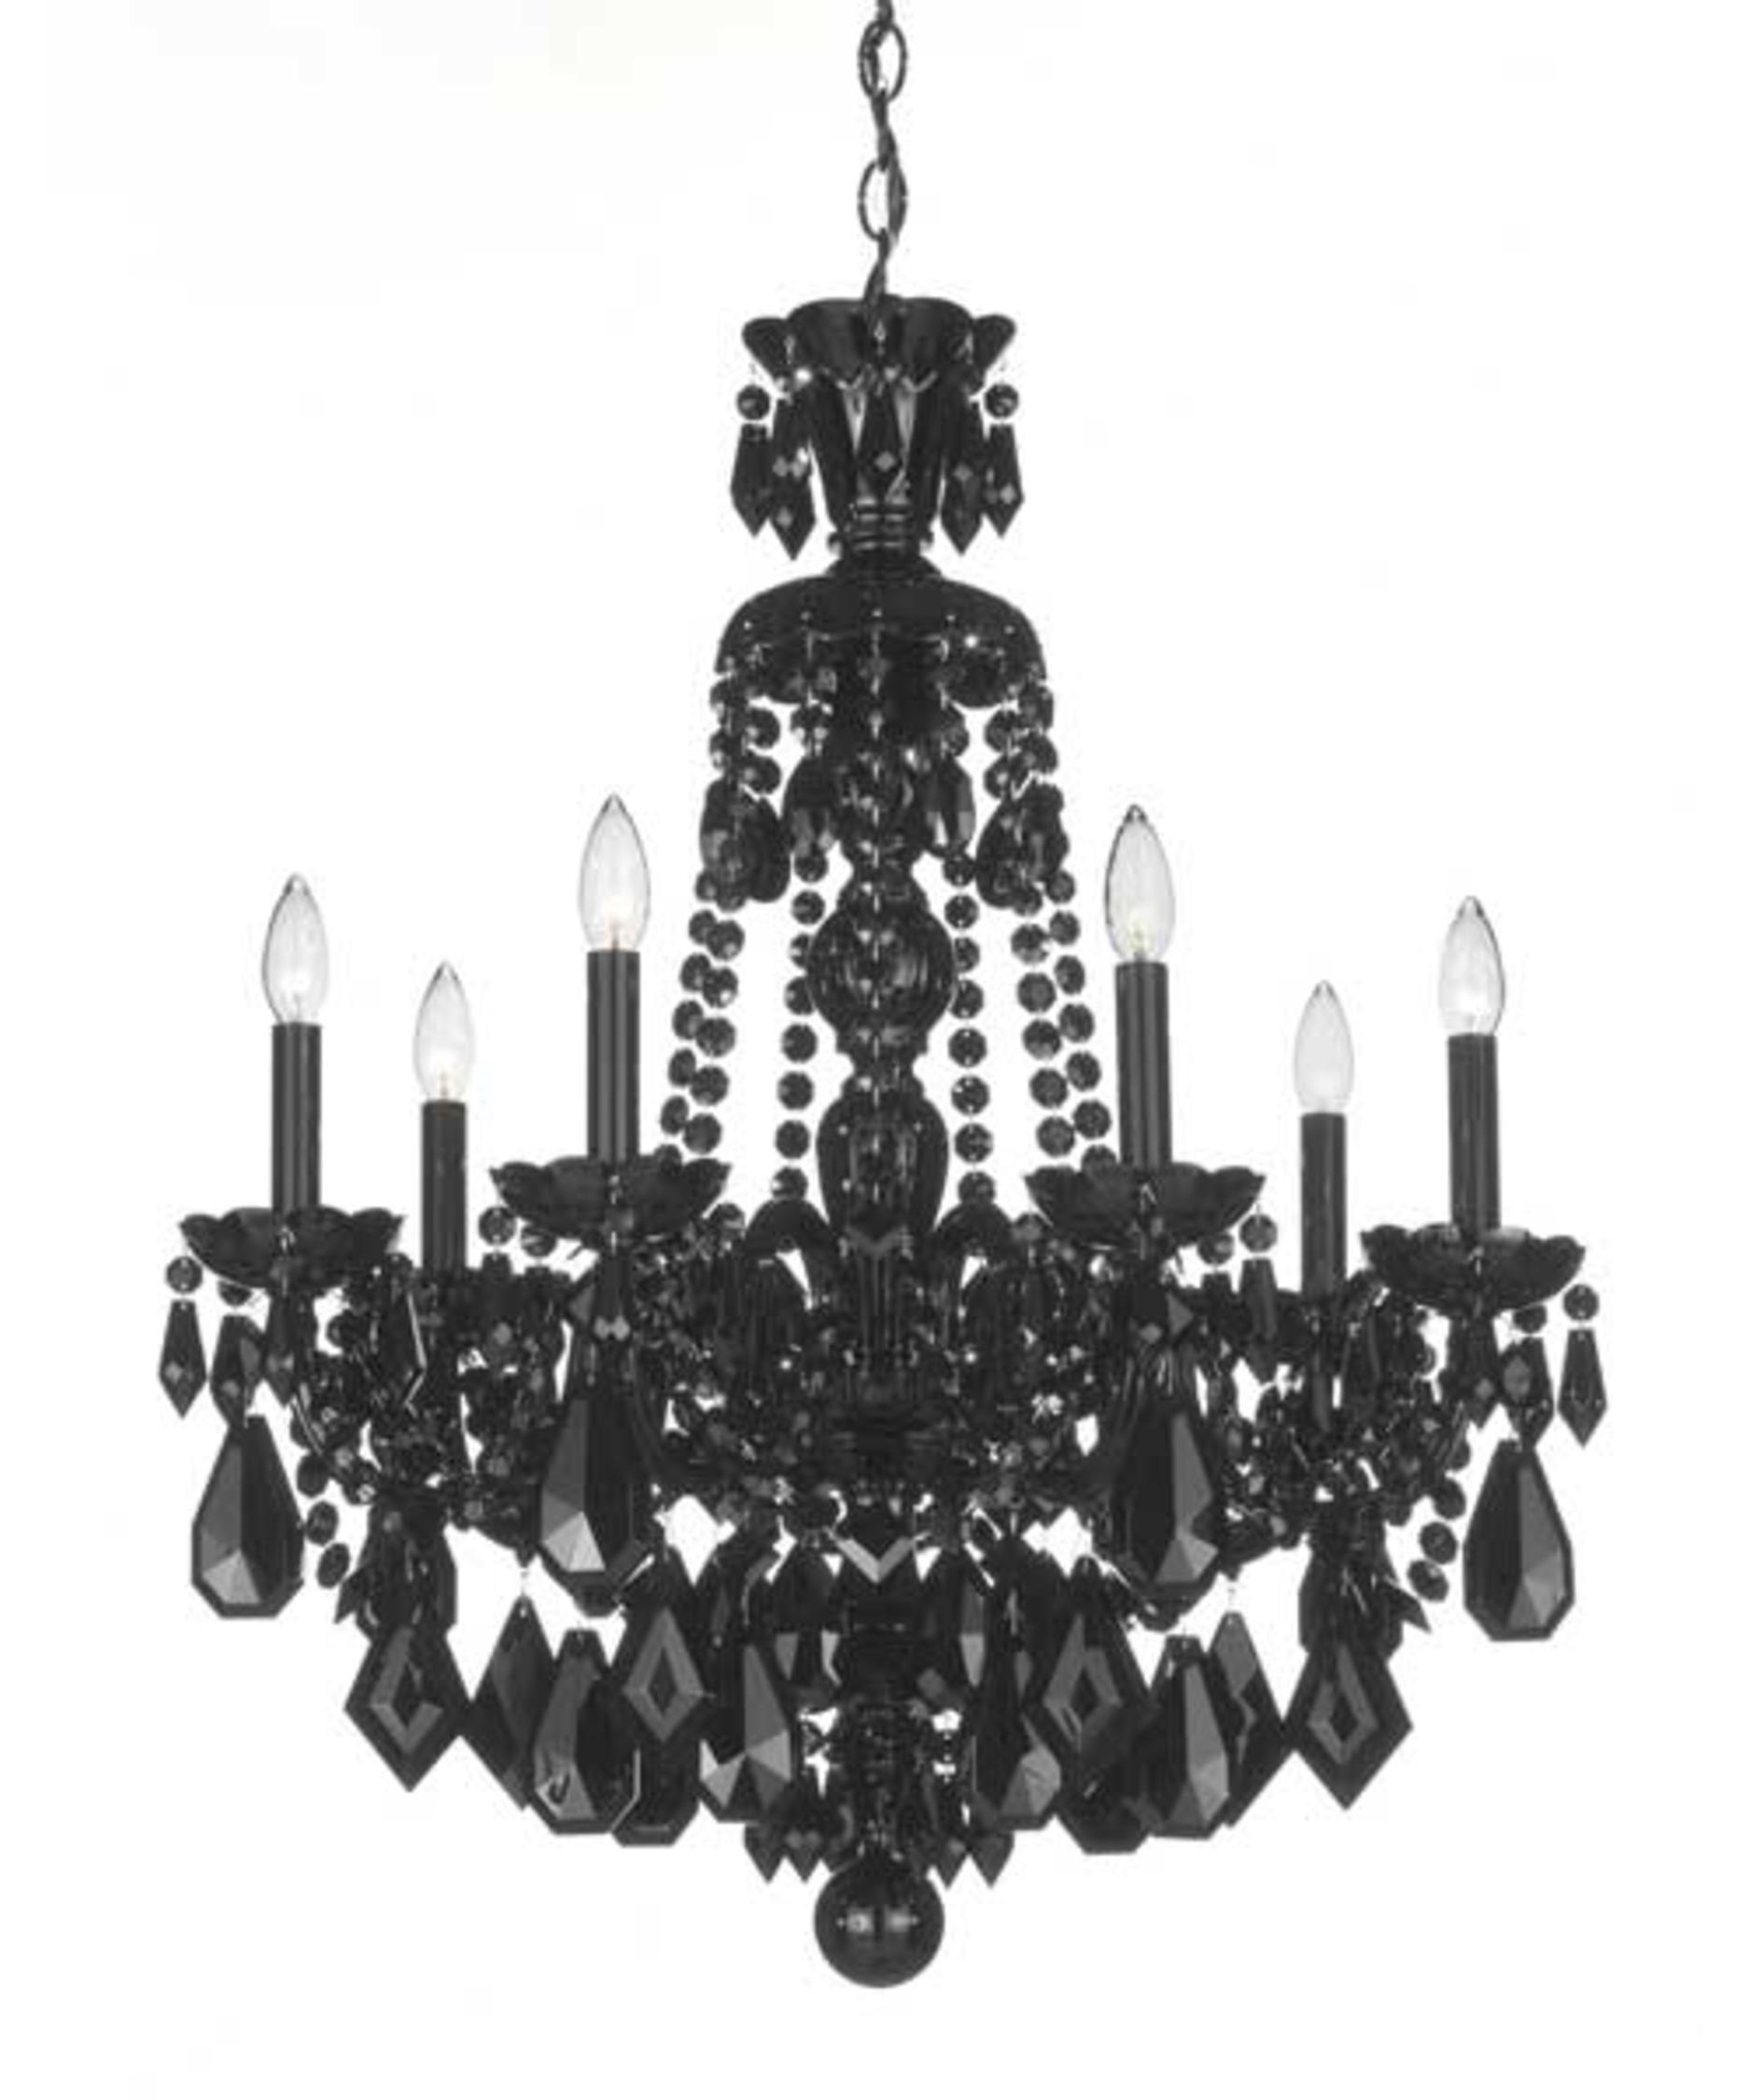 Schonbek Hamilton Black 24 Inch Wide 7 Light Chandelier  Capitol